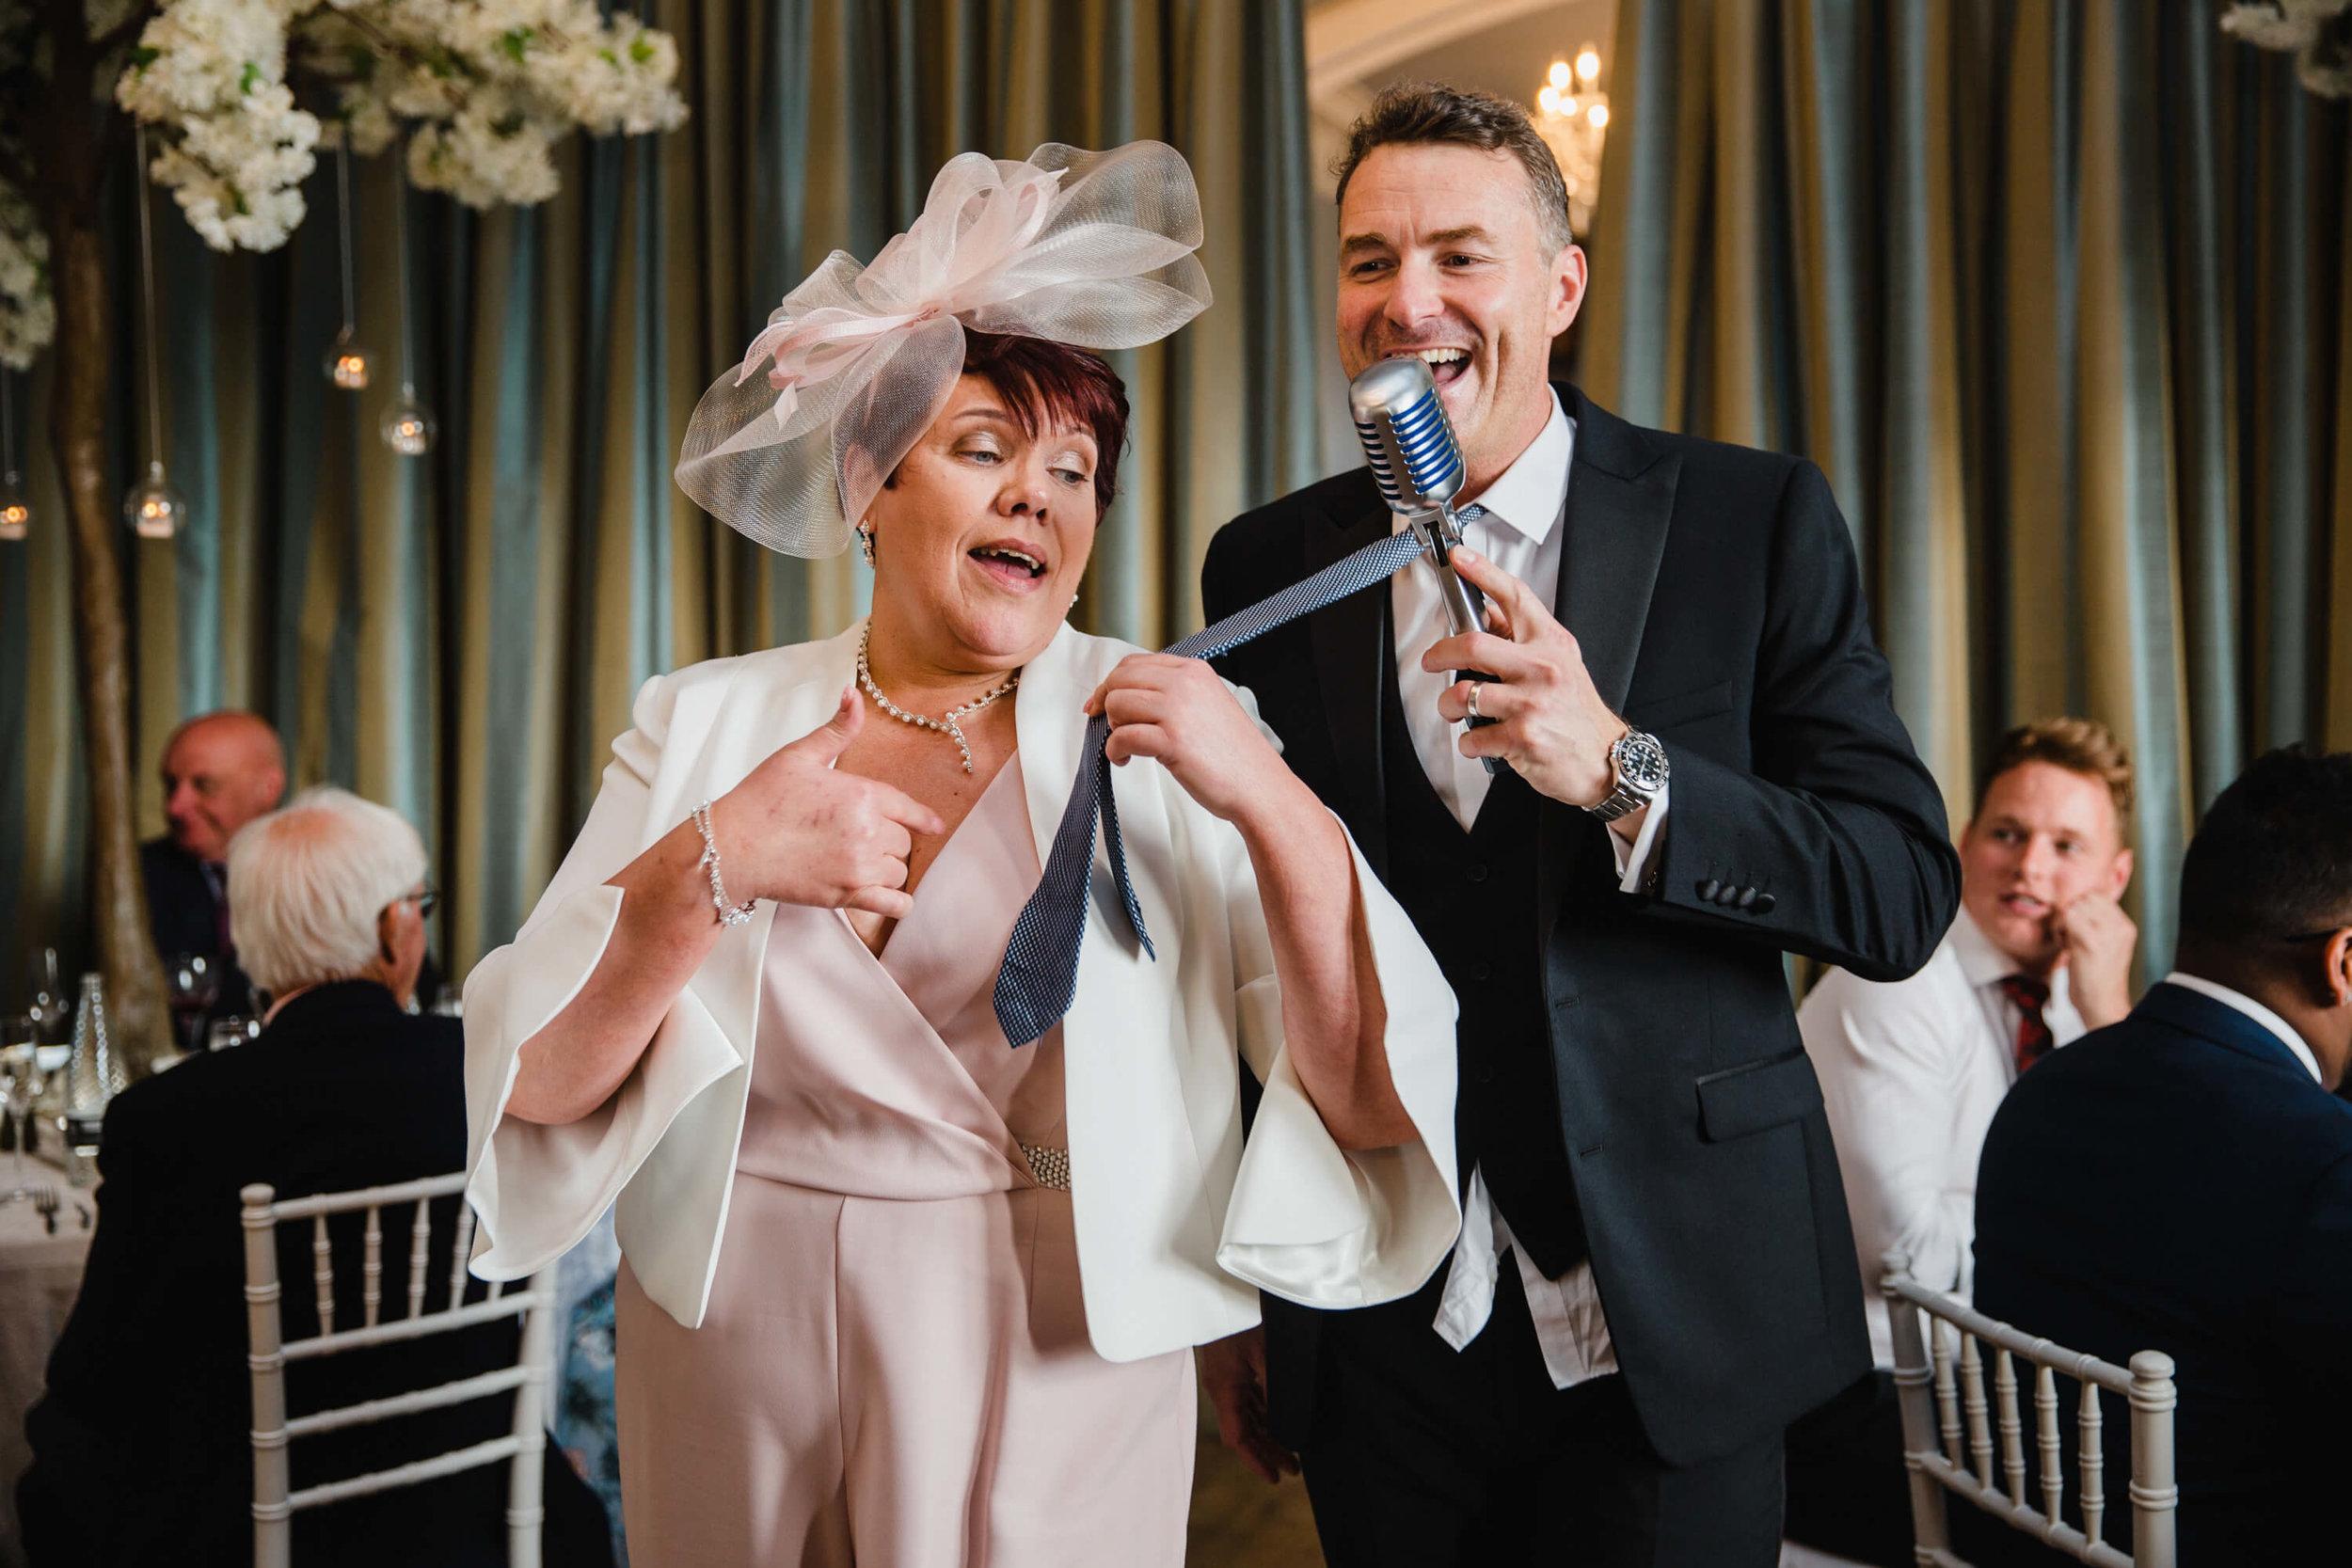 mother of bride pulling howard wing wedding singer by tie